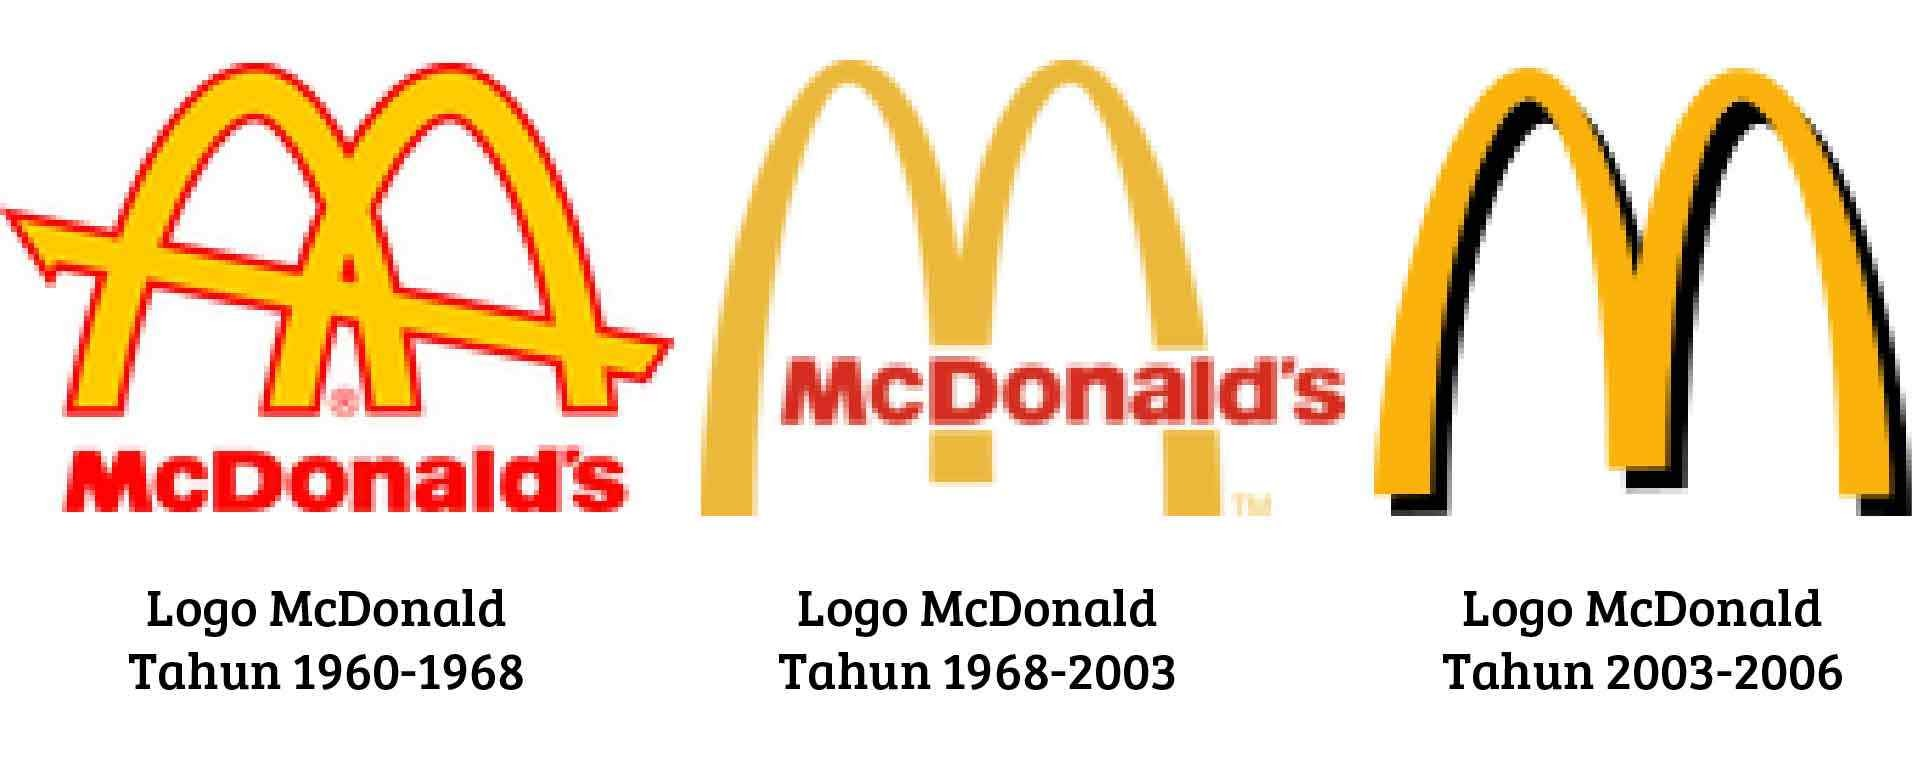 logo-mcdonald-dari-tahun-ke-tahun